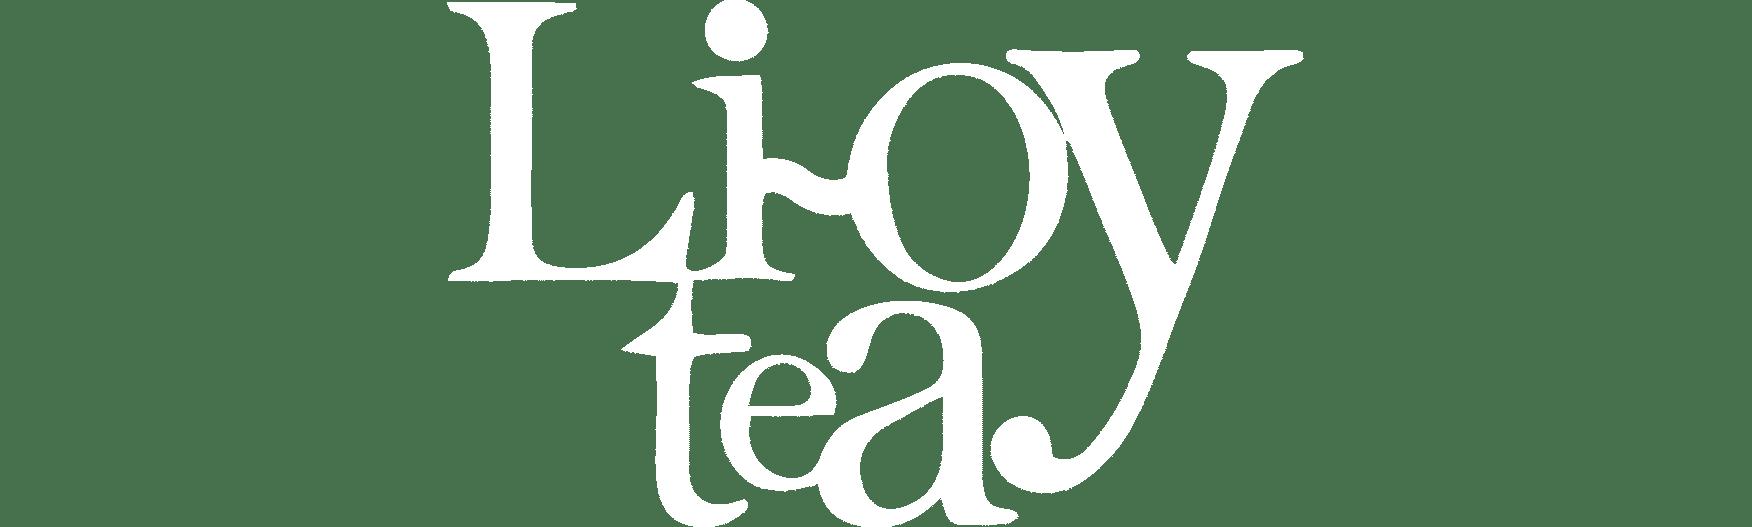 Li-oy Tea